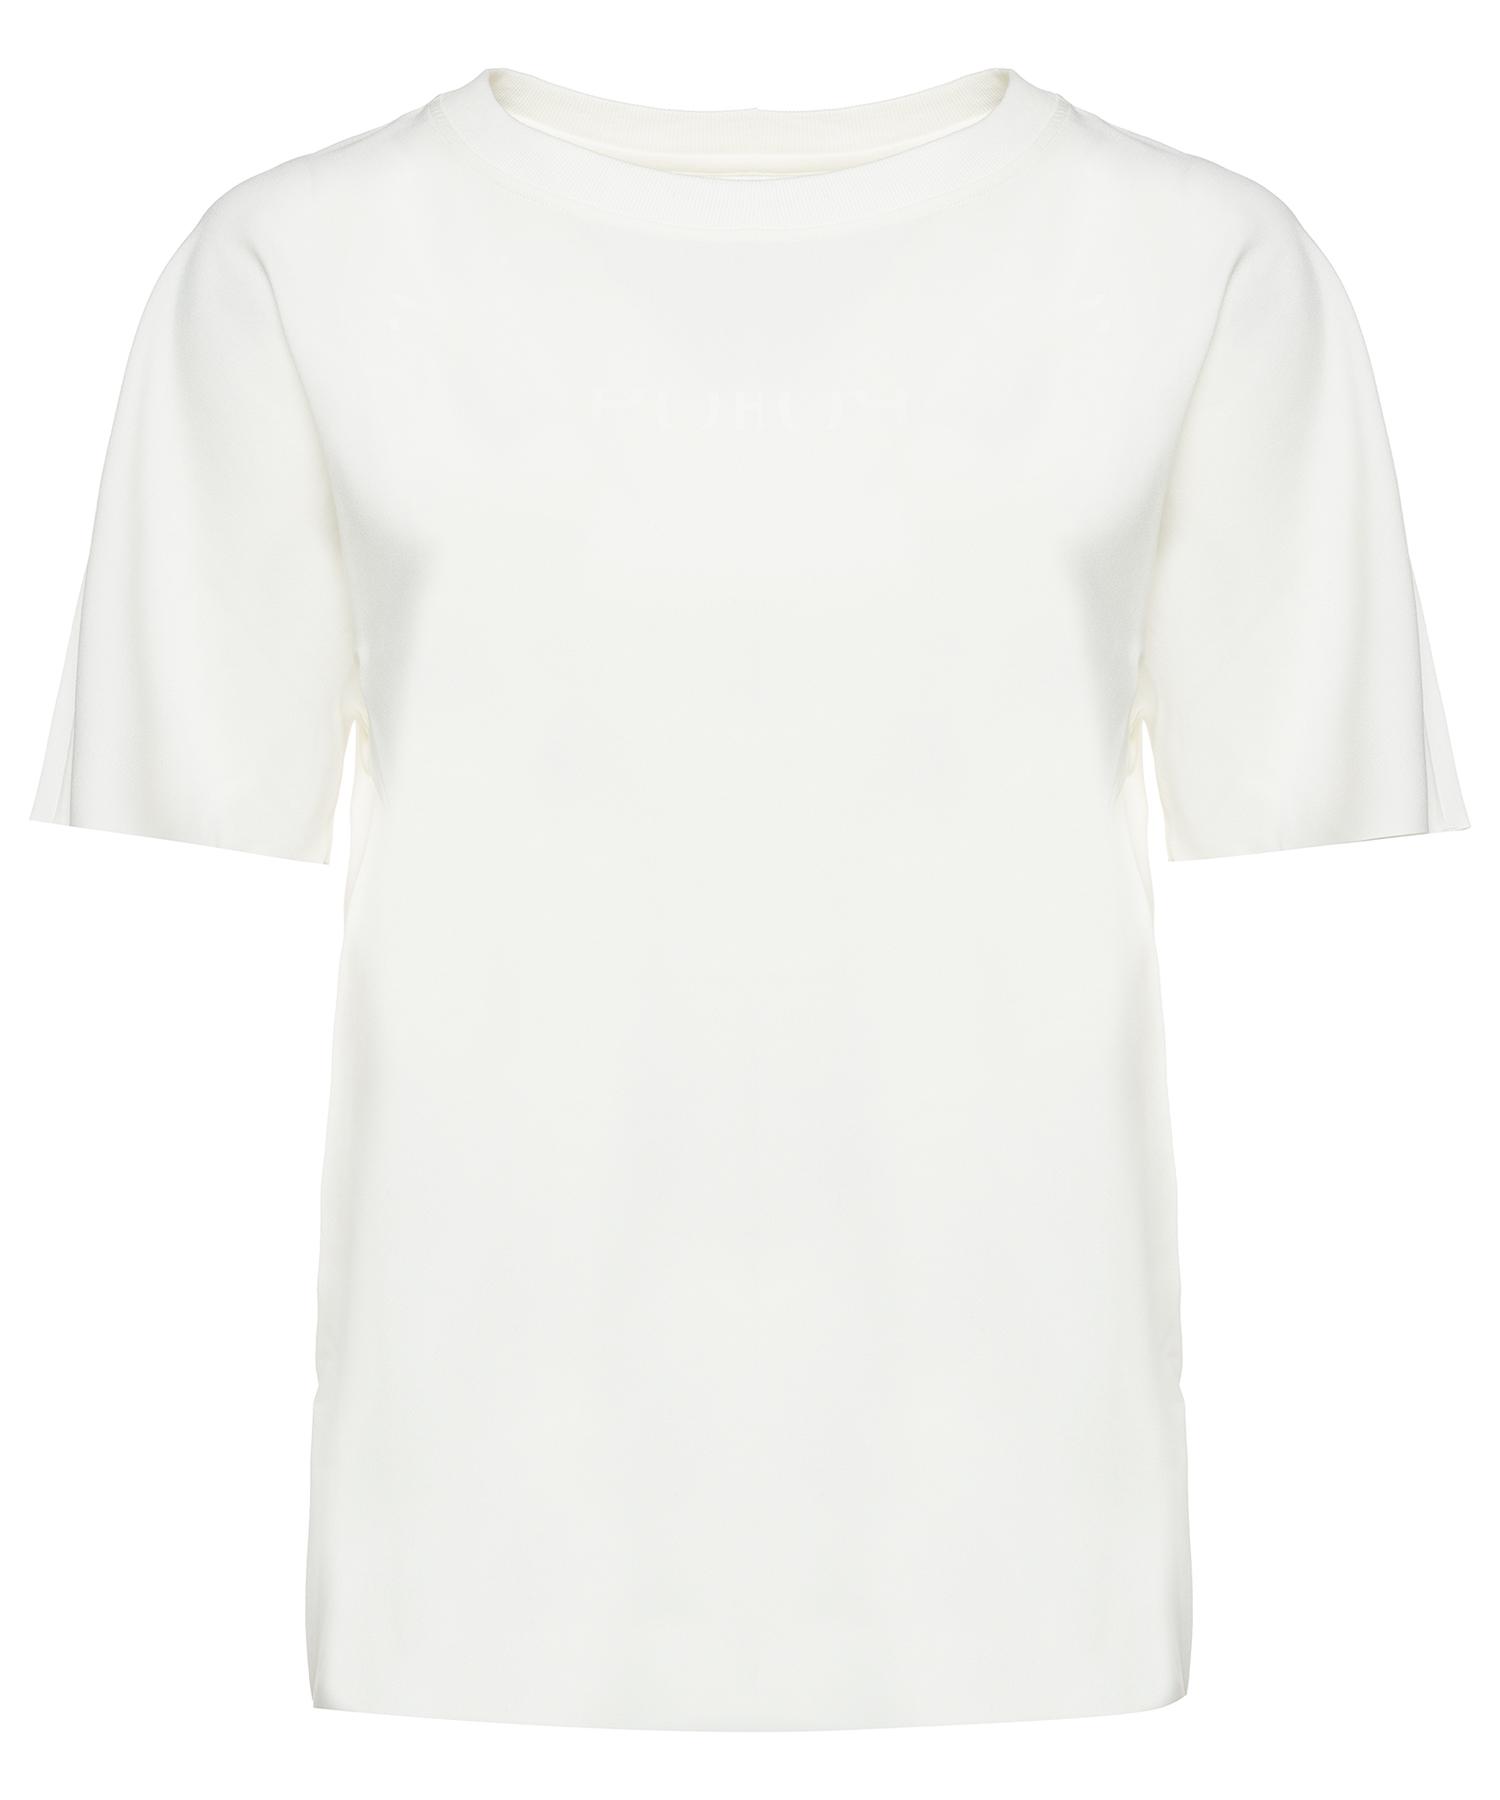 Marc Cain Sports shirt